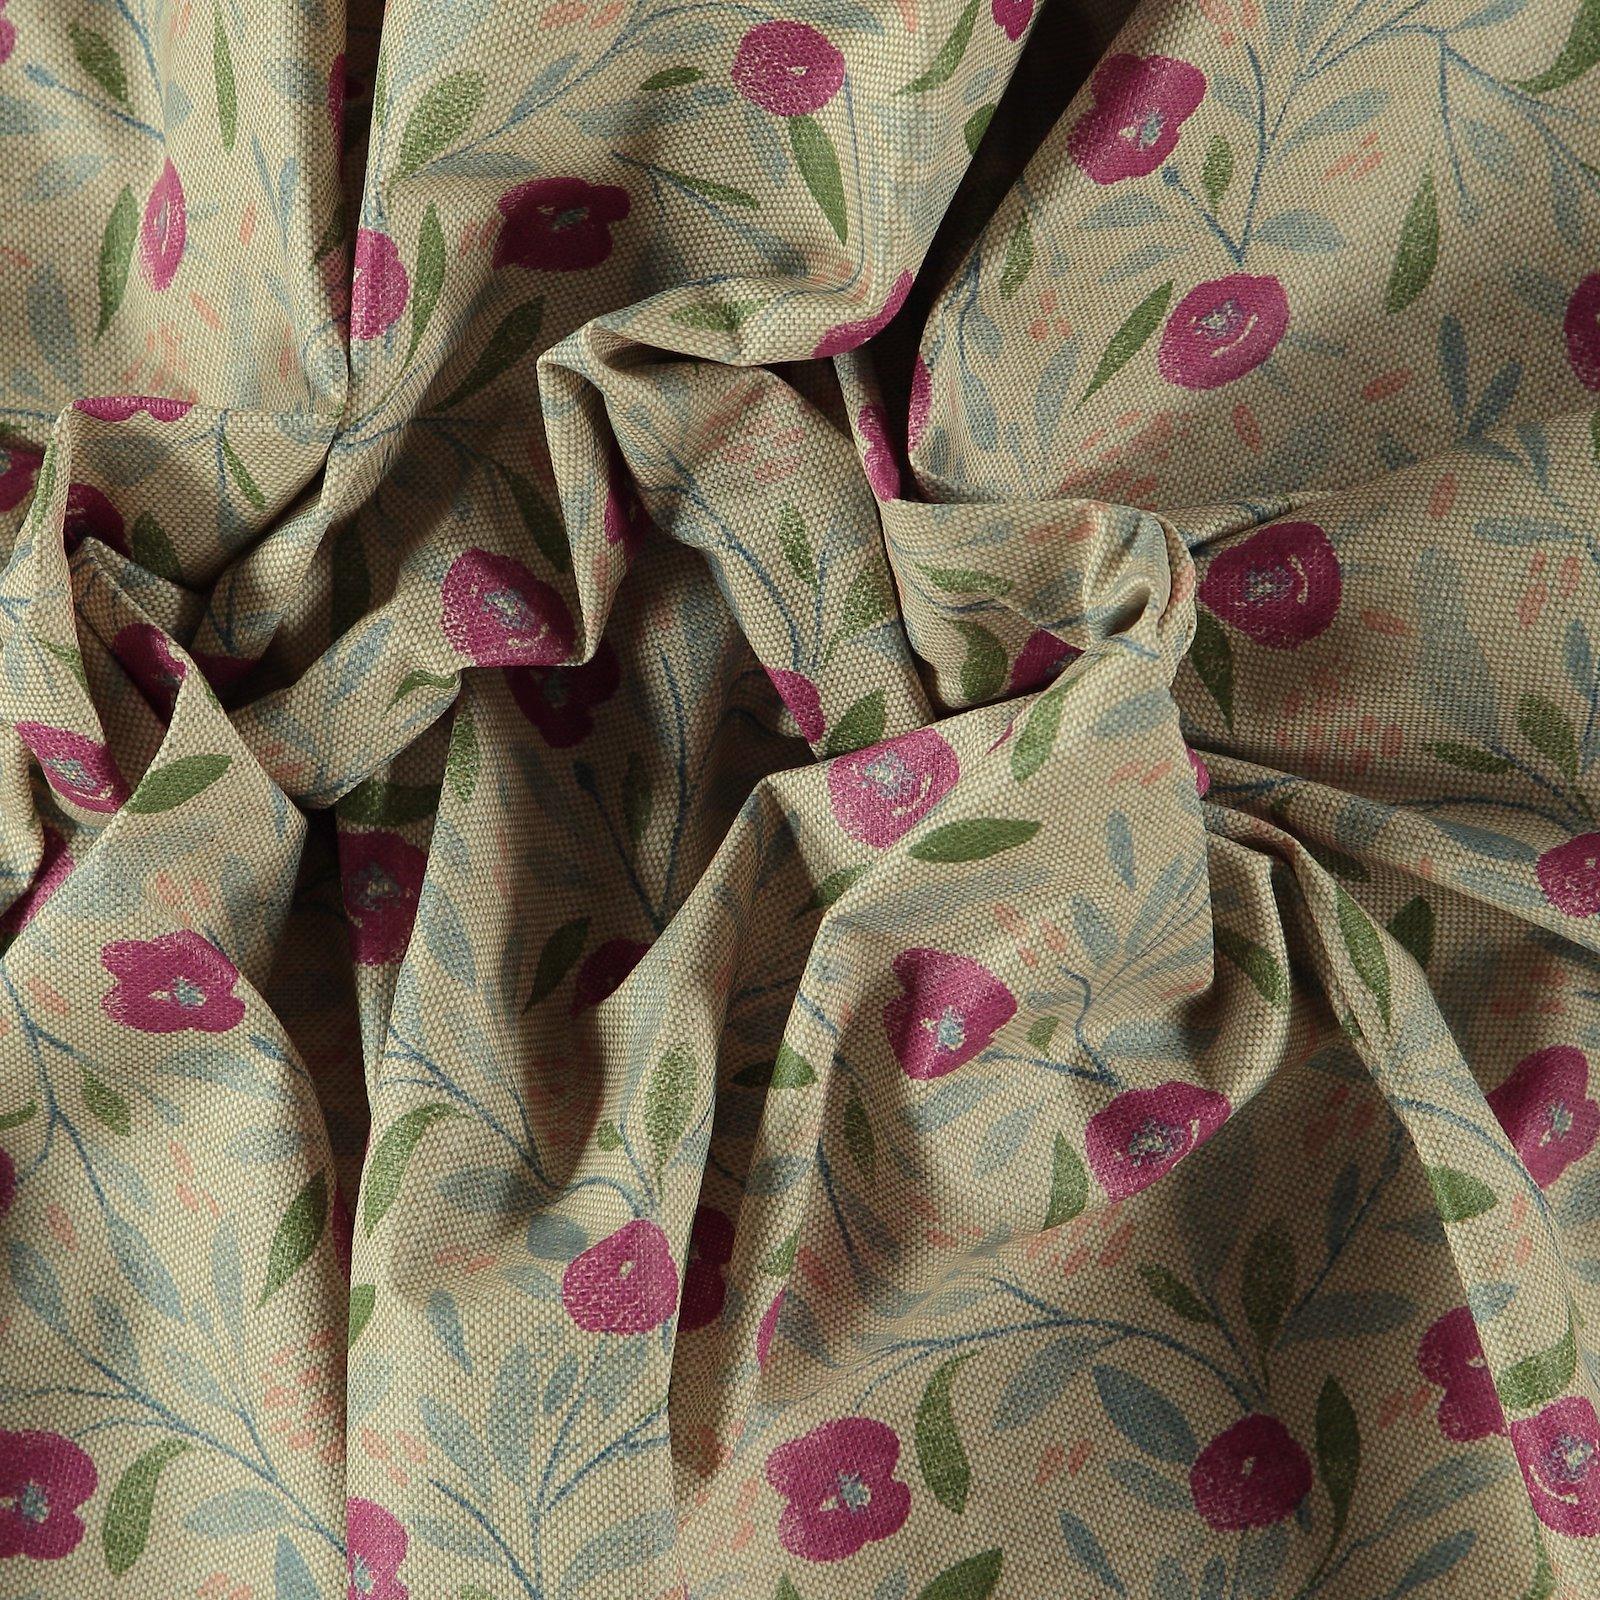 Woven oilcloth linenlook w pink flowers